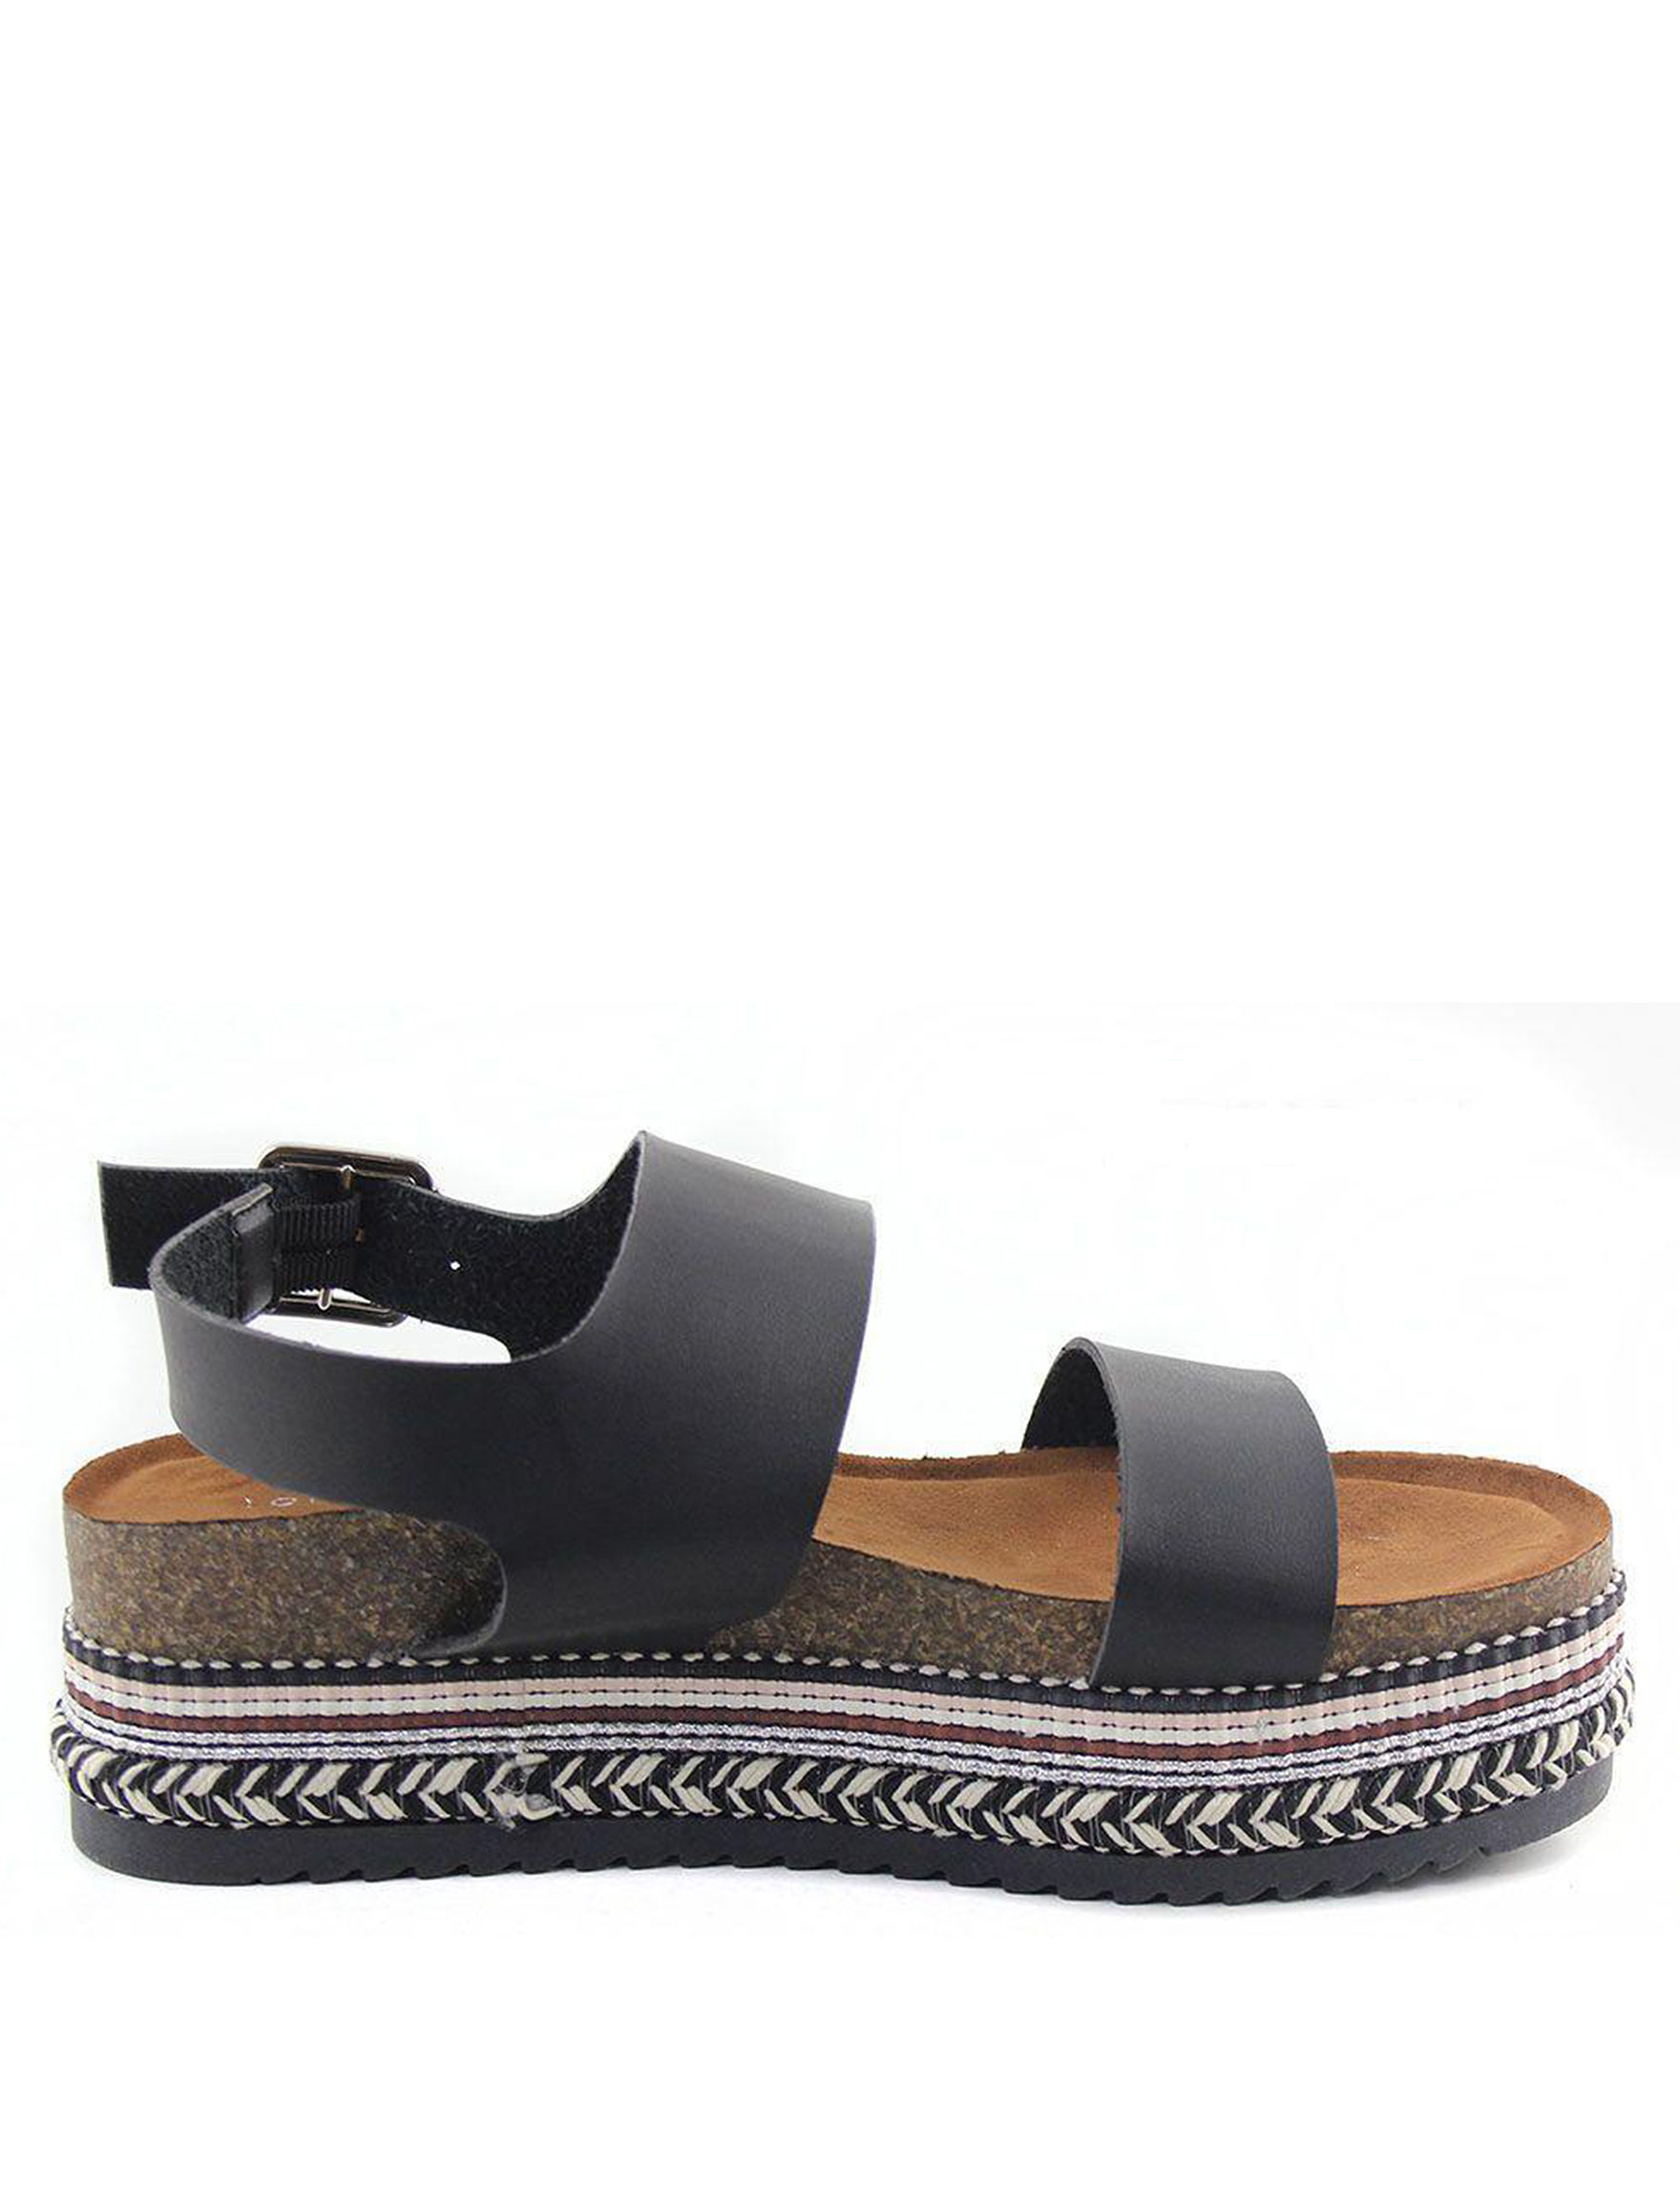 London Rag Black Espadrille Flat Sandals Platform